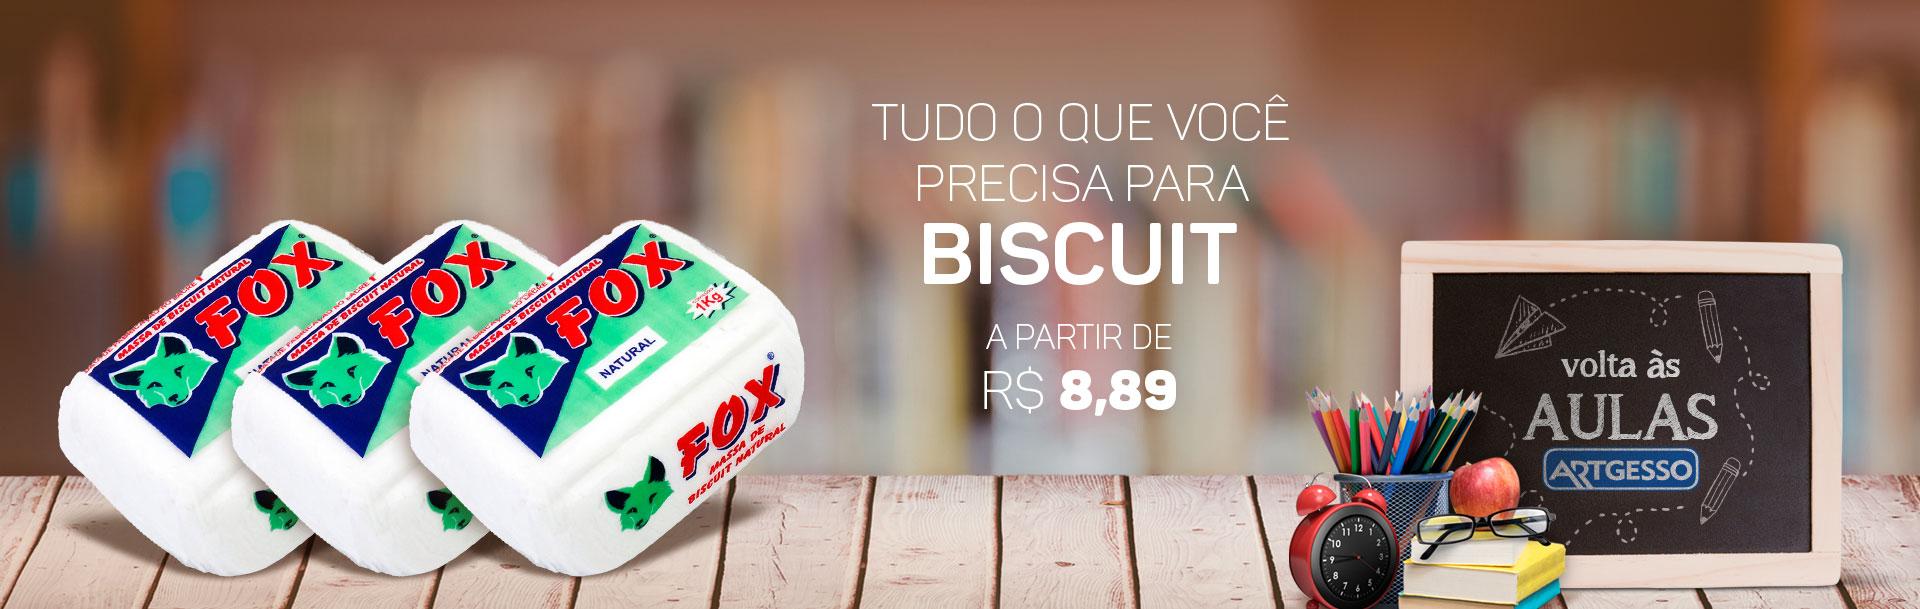 Biscuit - Volta as aulas